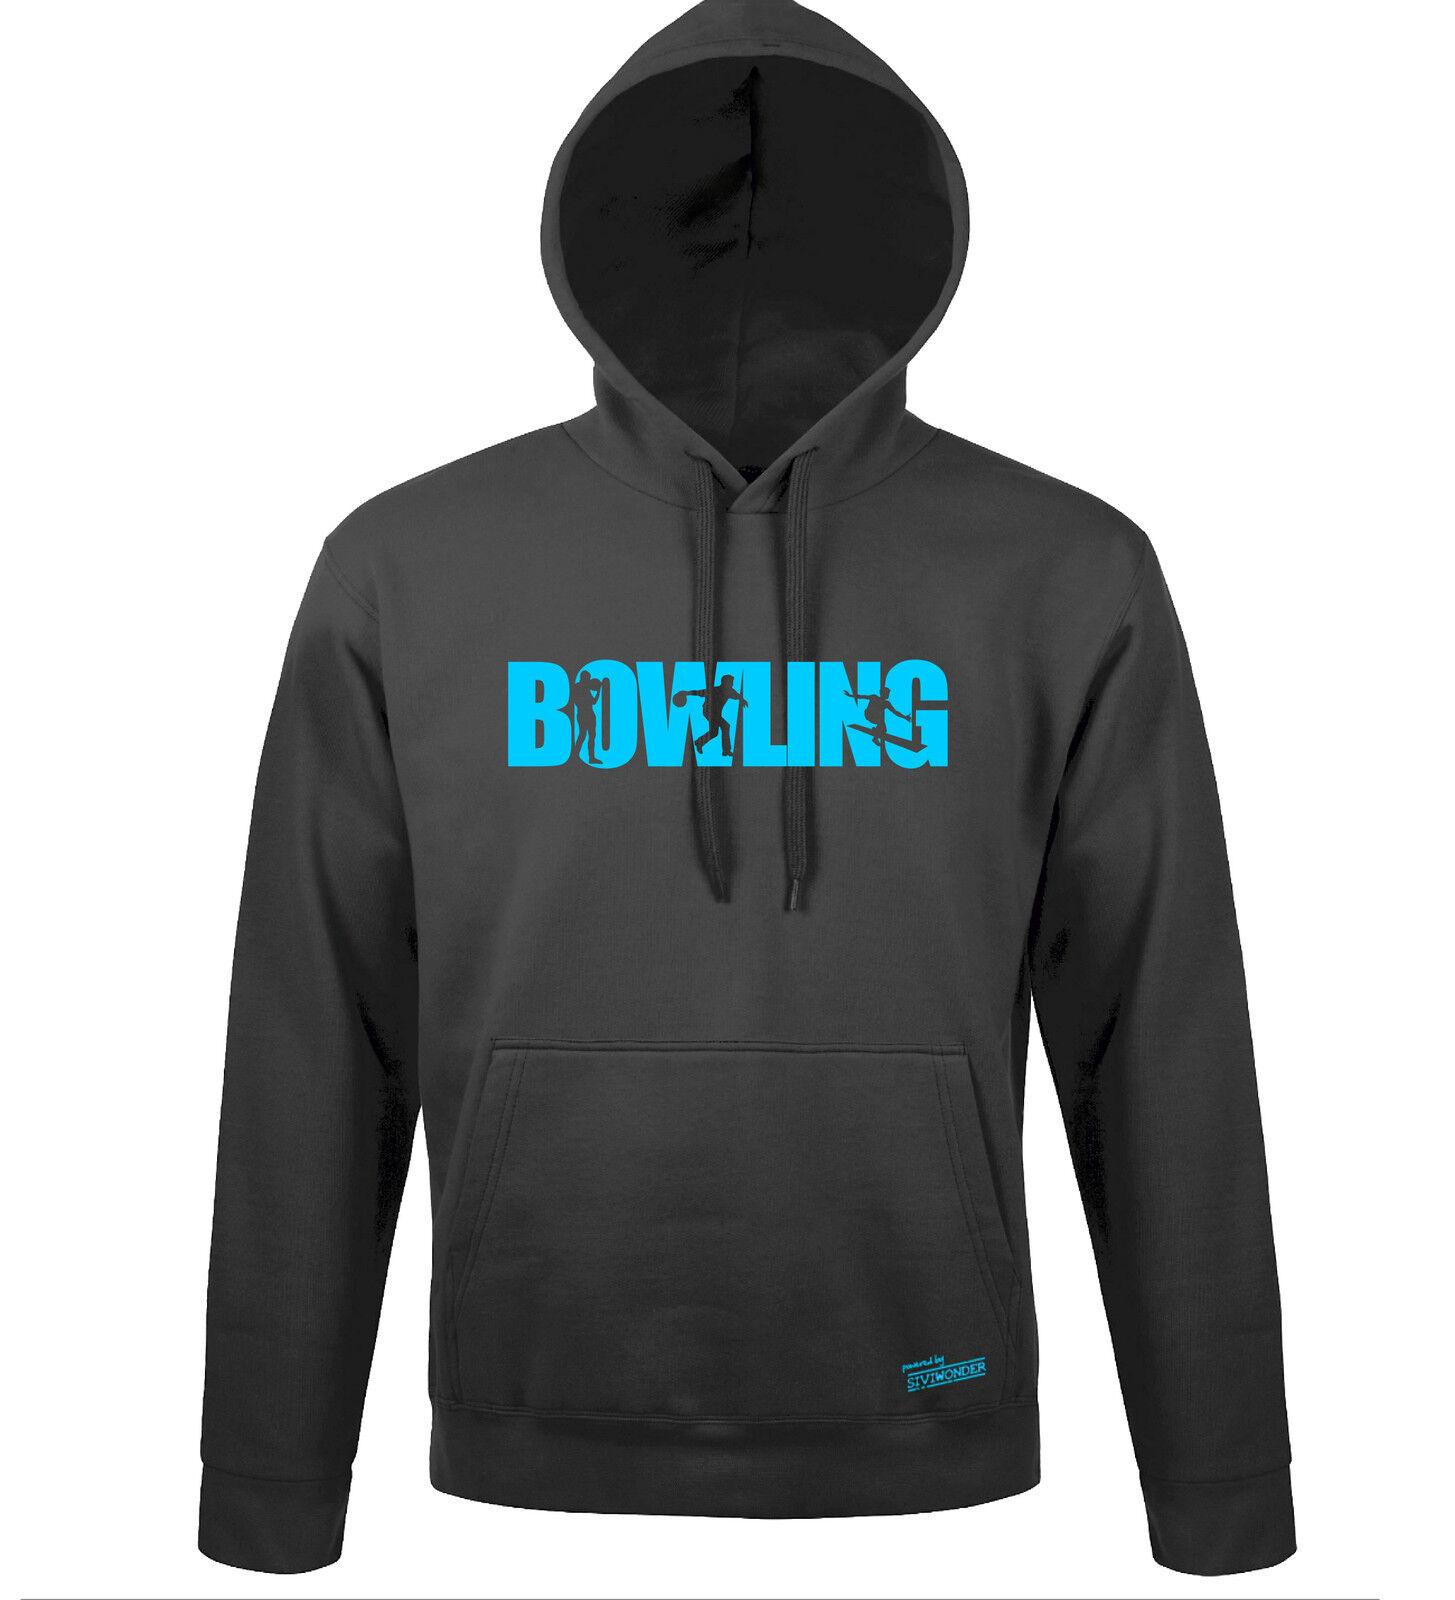 Sweatshirt Hoodie Kapuze BOWLING Schrift Sport Siviwonder